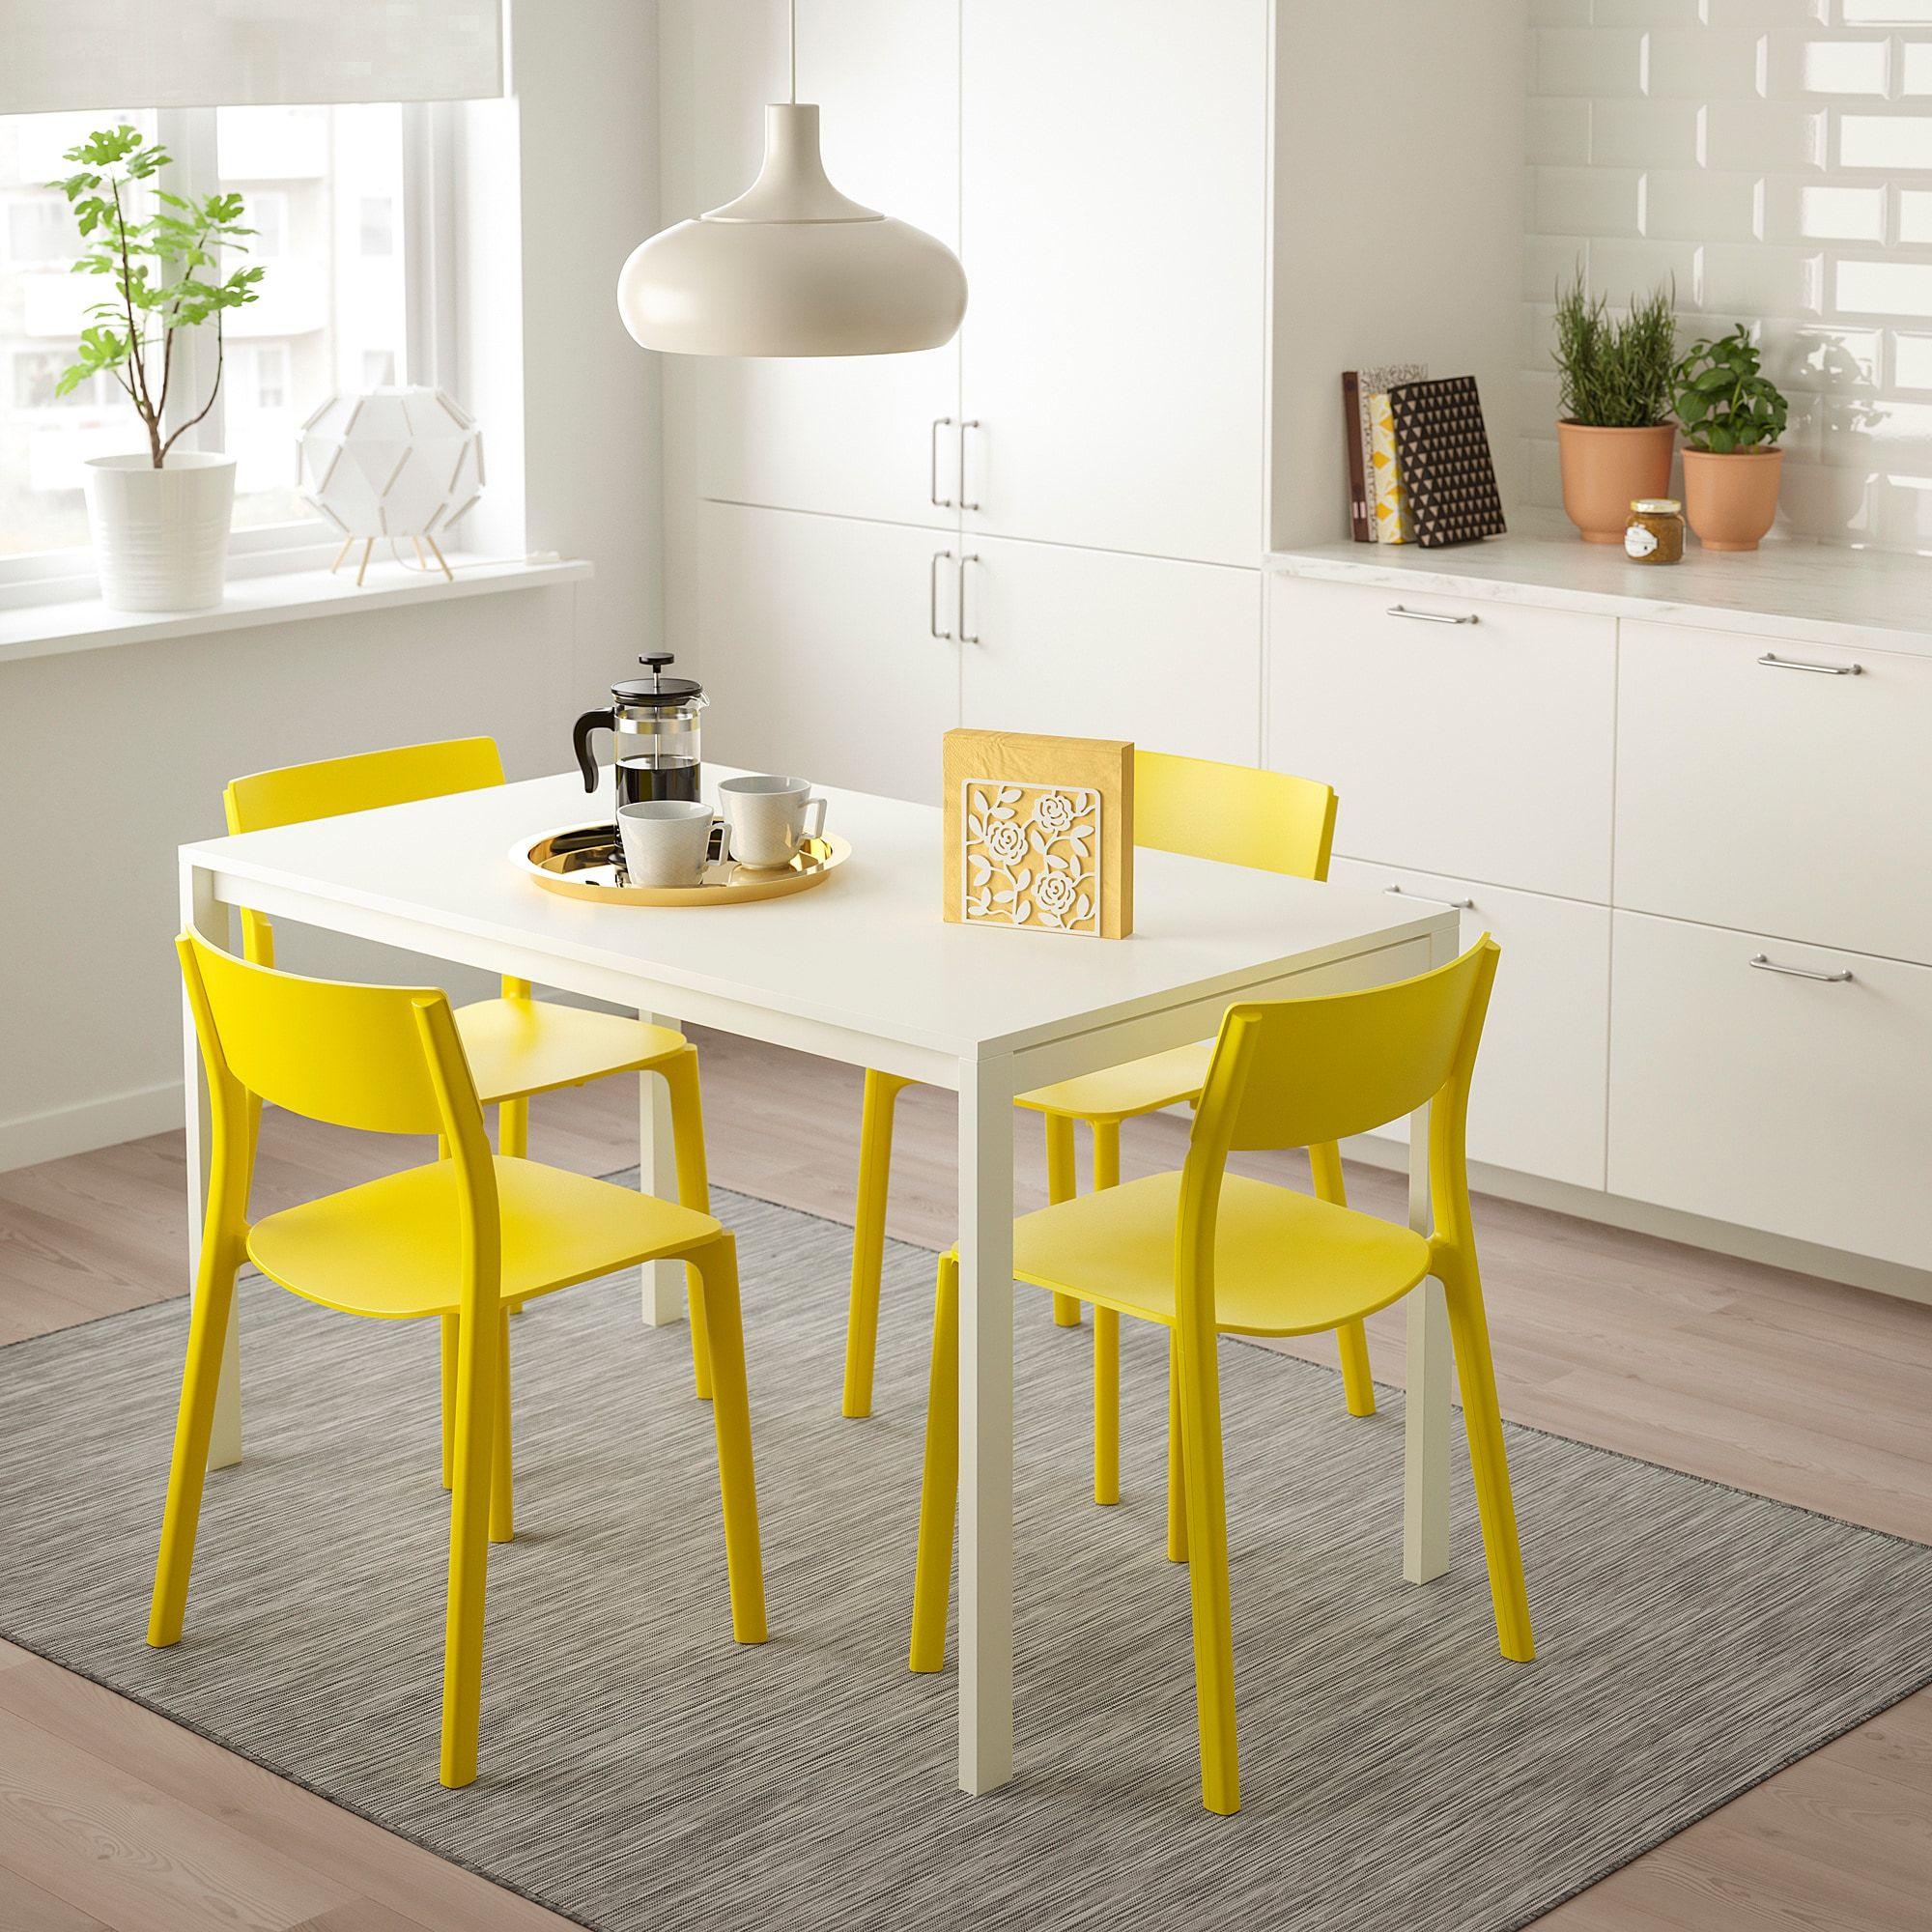 Ikea Janinge Chair Yellow Products In 2019 Ikea